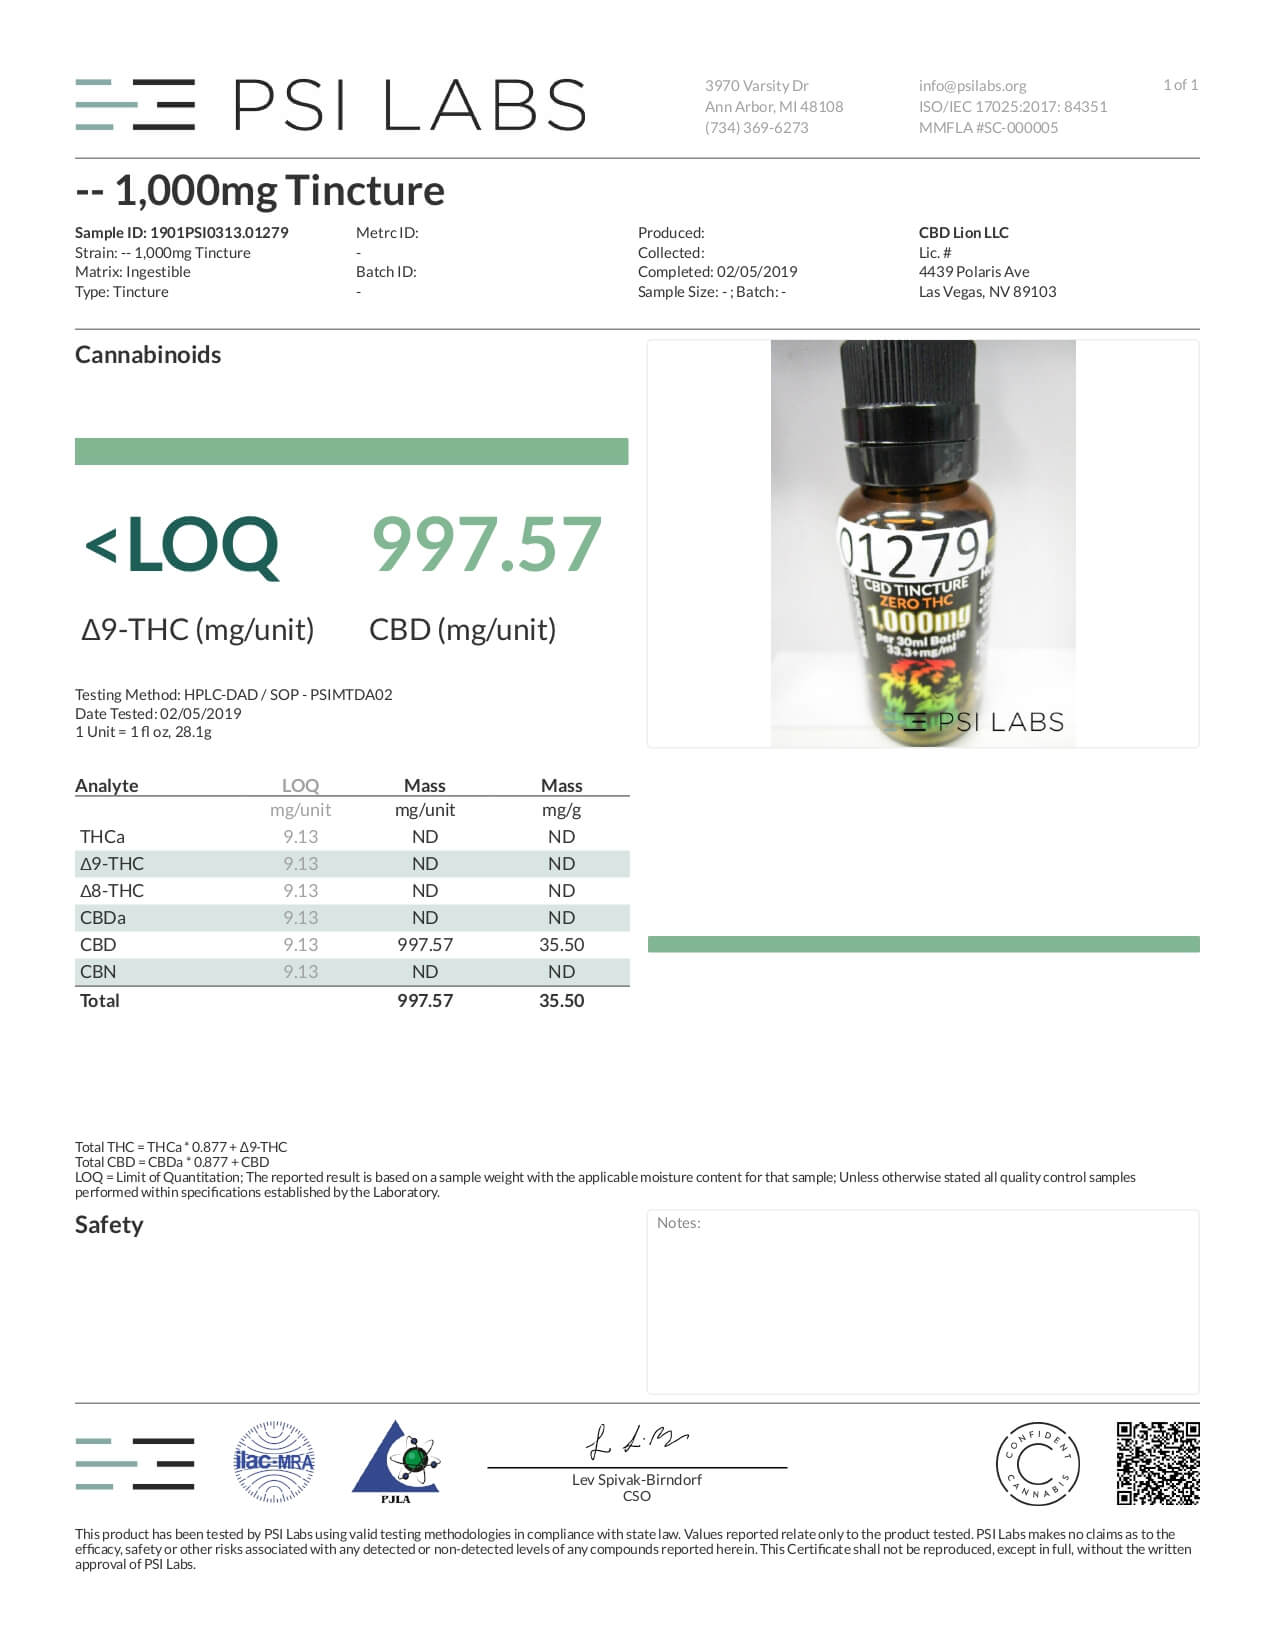 CBD Lion CBD Tincture Oil 1000mg Lab Report